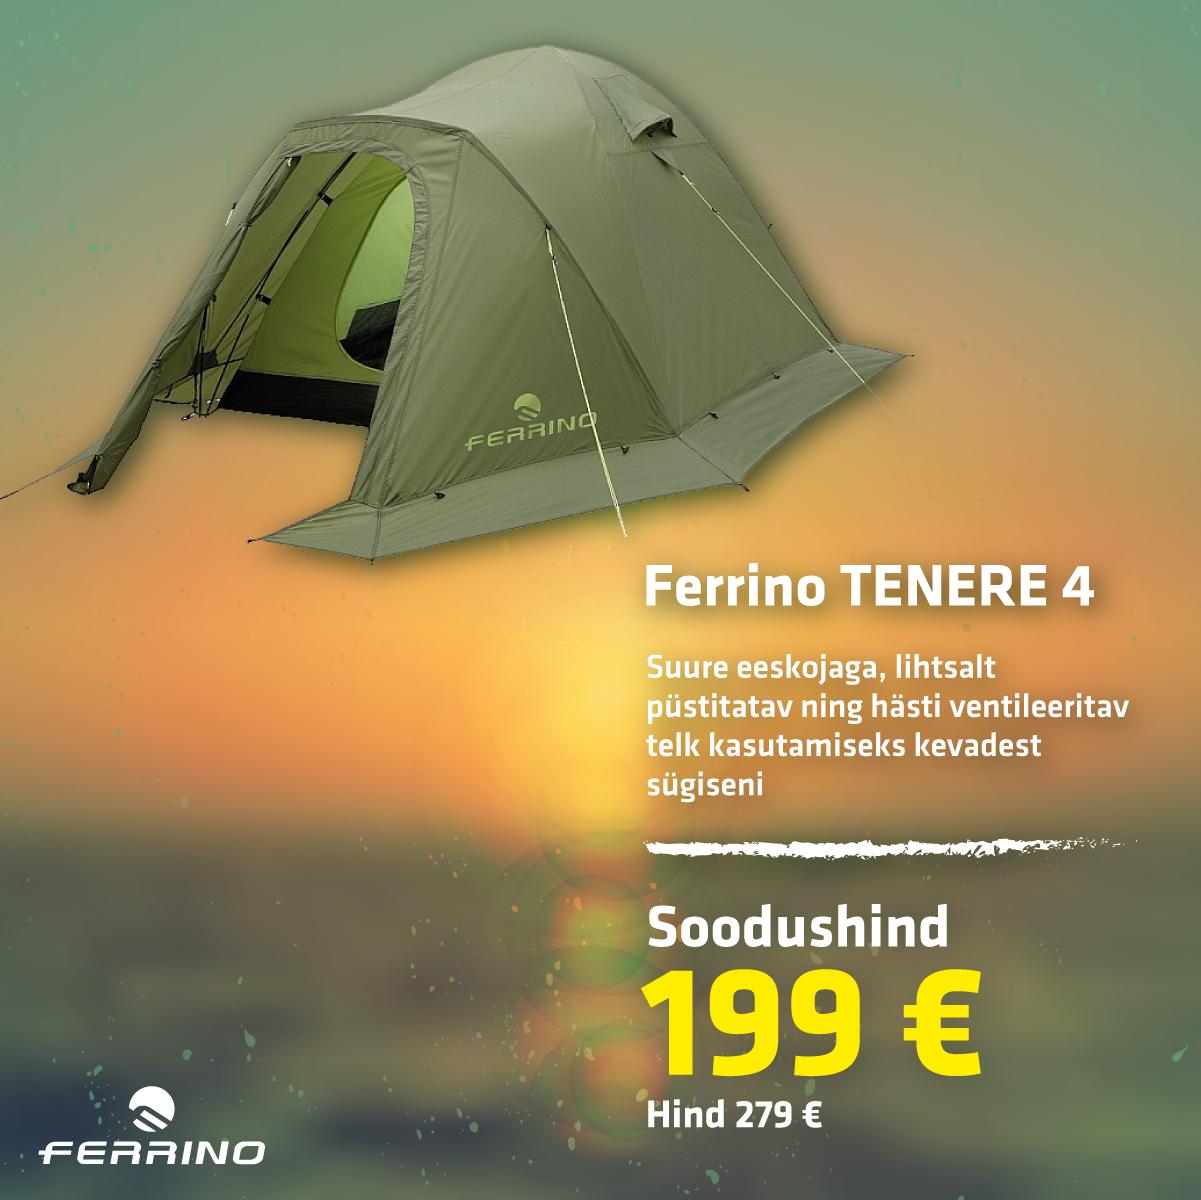 Ferrino Tenere 4